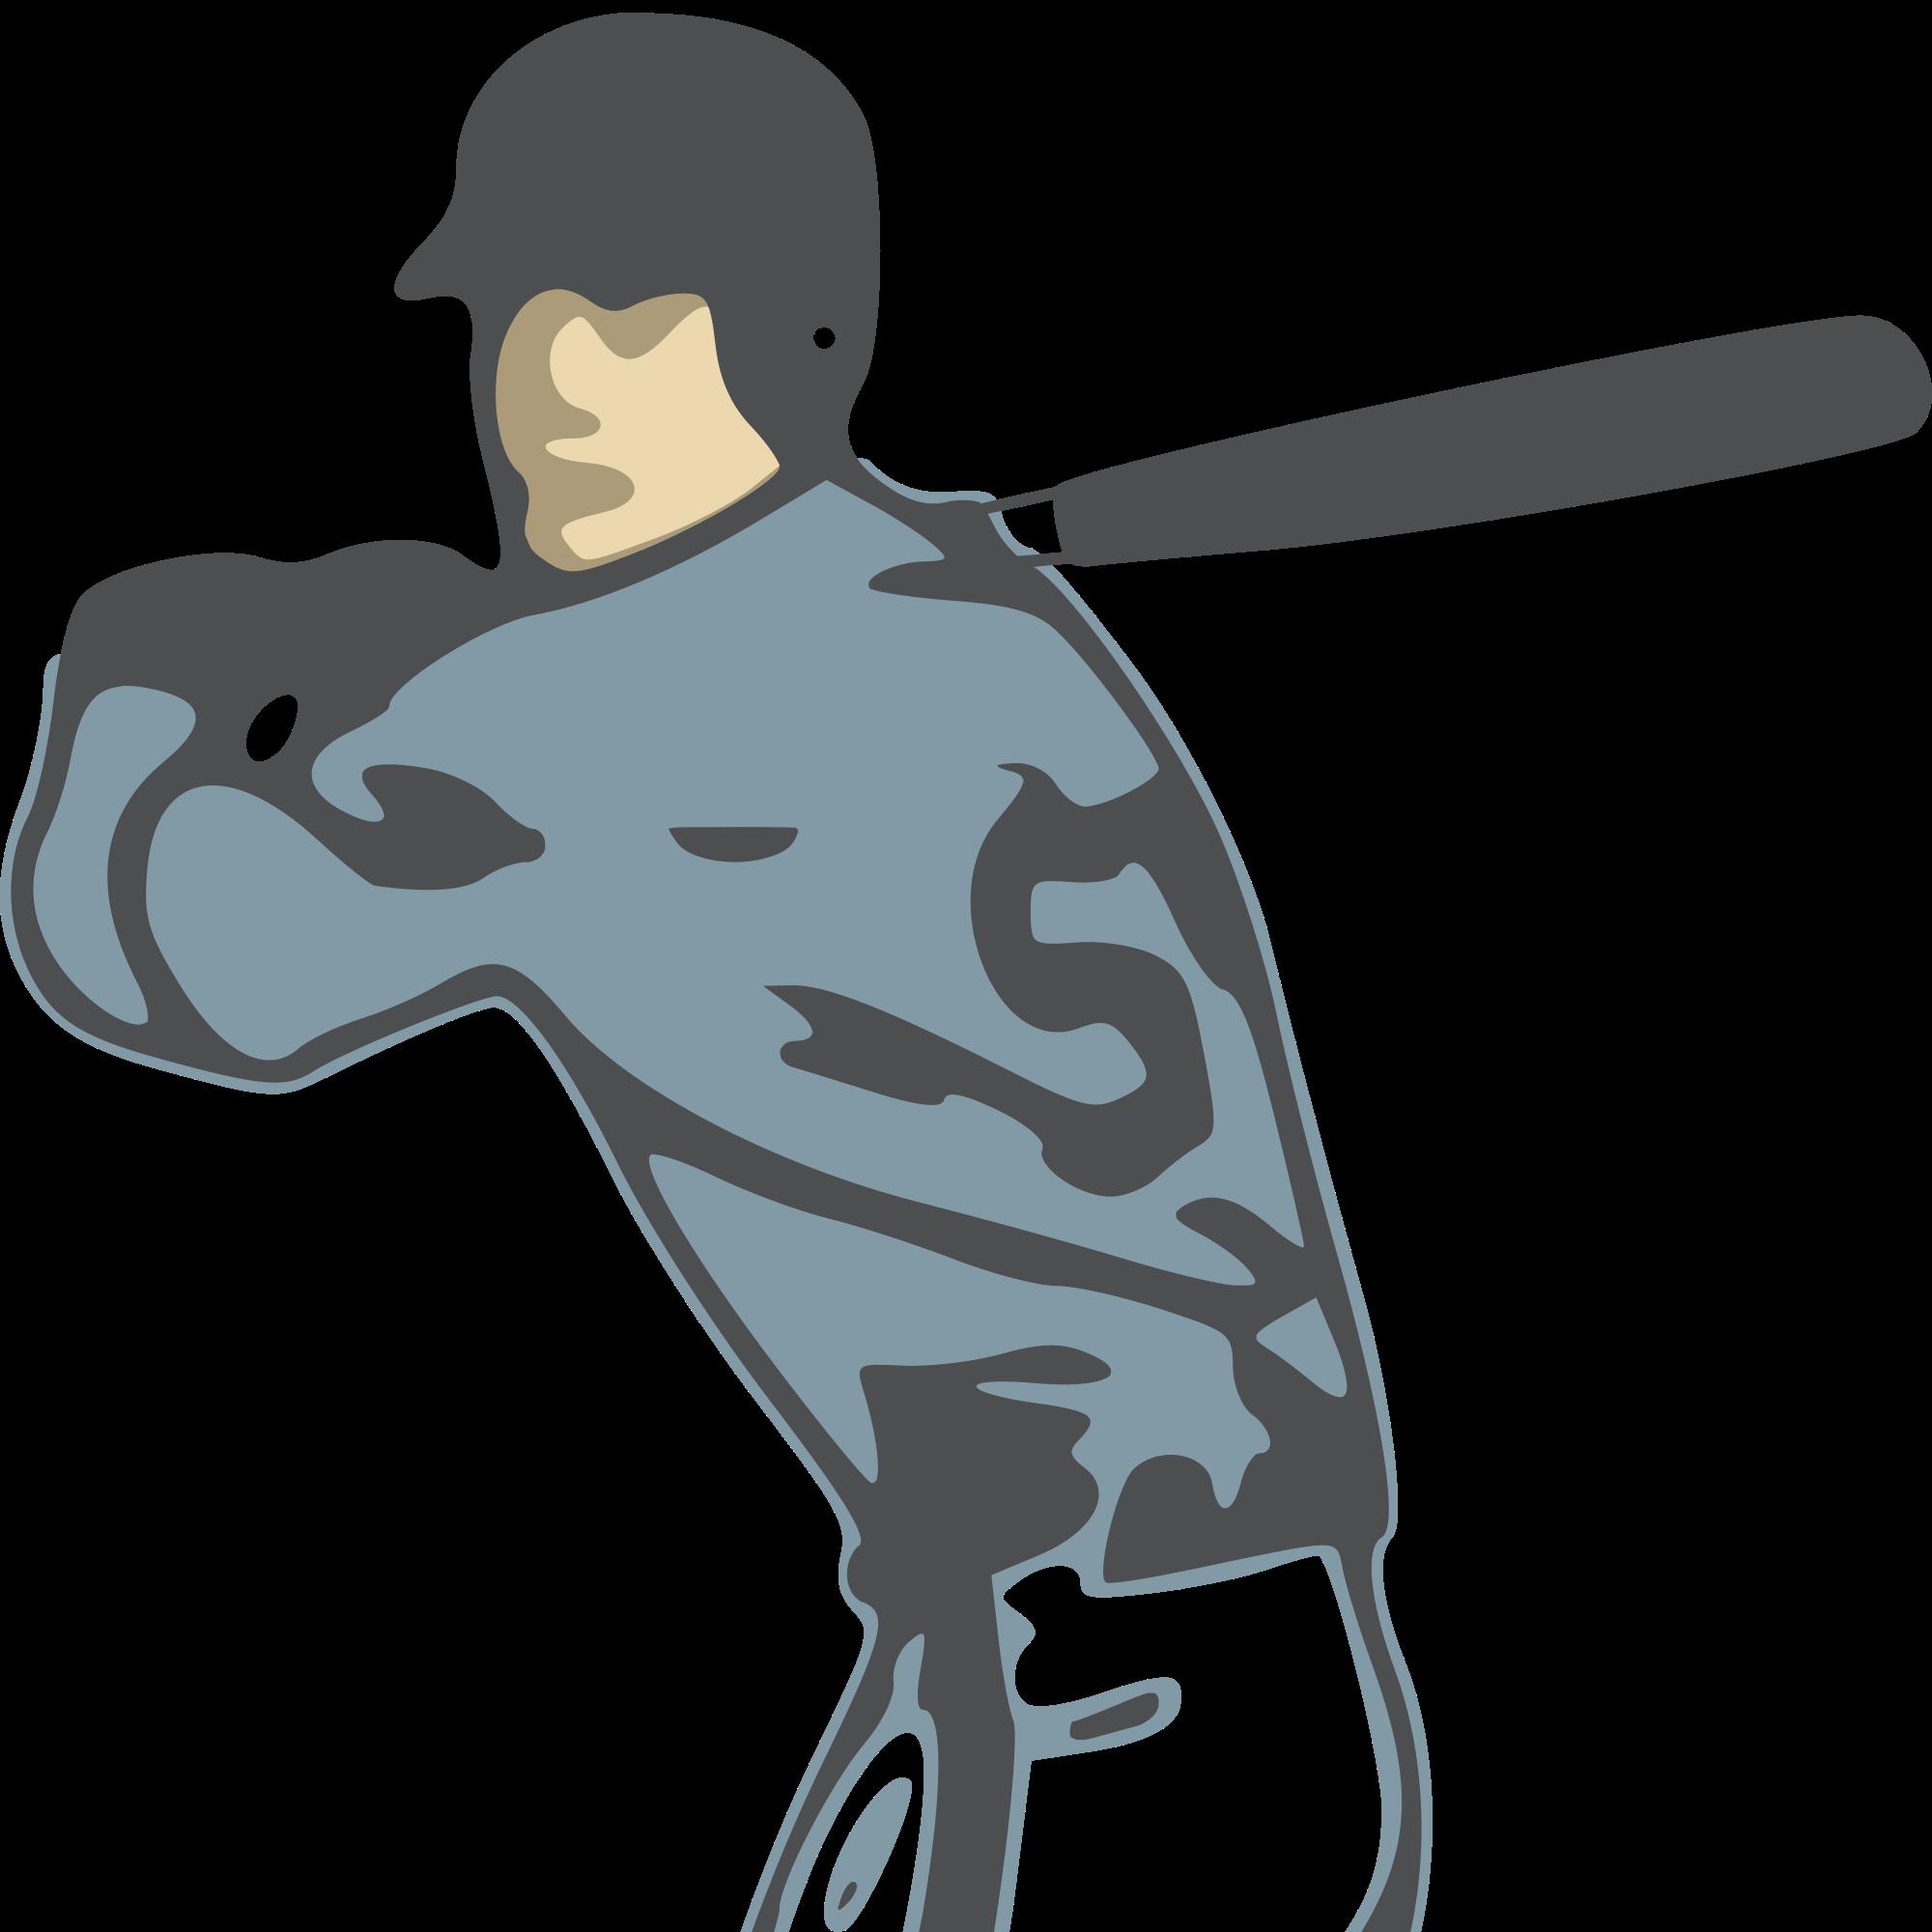 clip transparent library Baseball Batter Clipart at GetDrawings